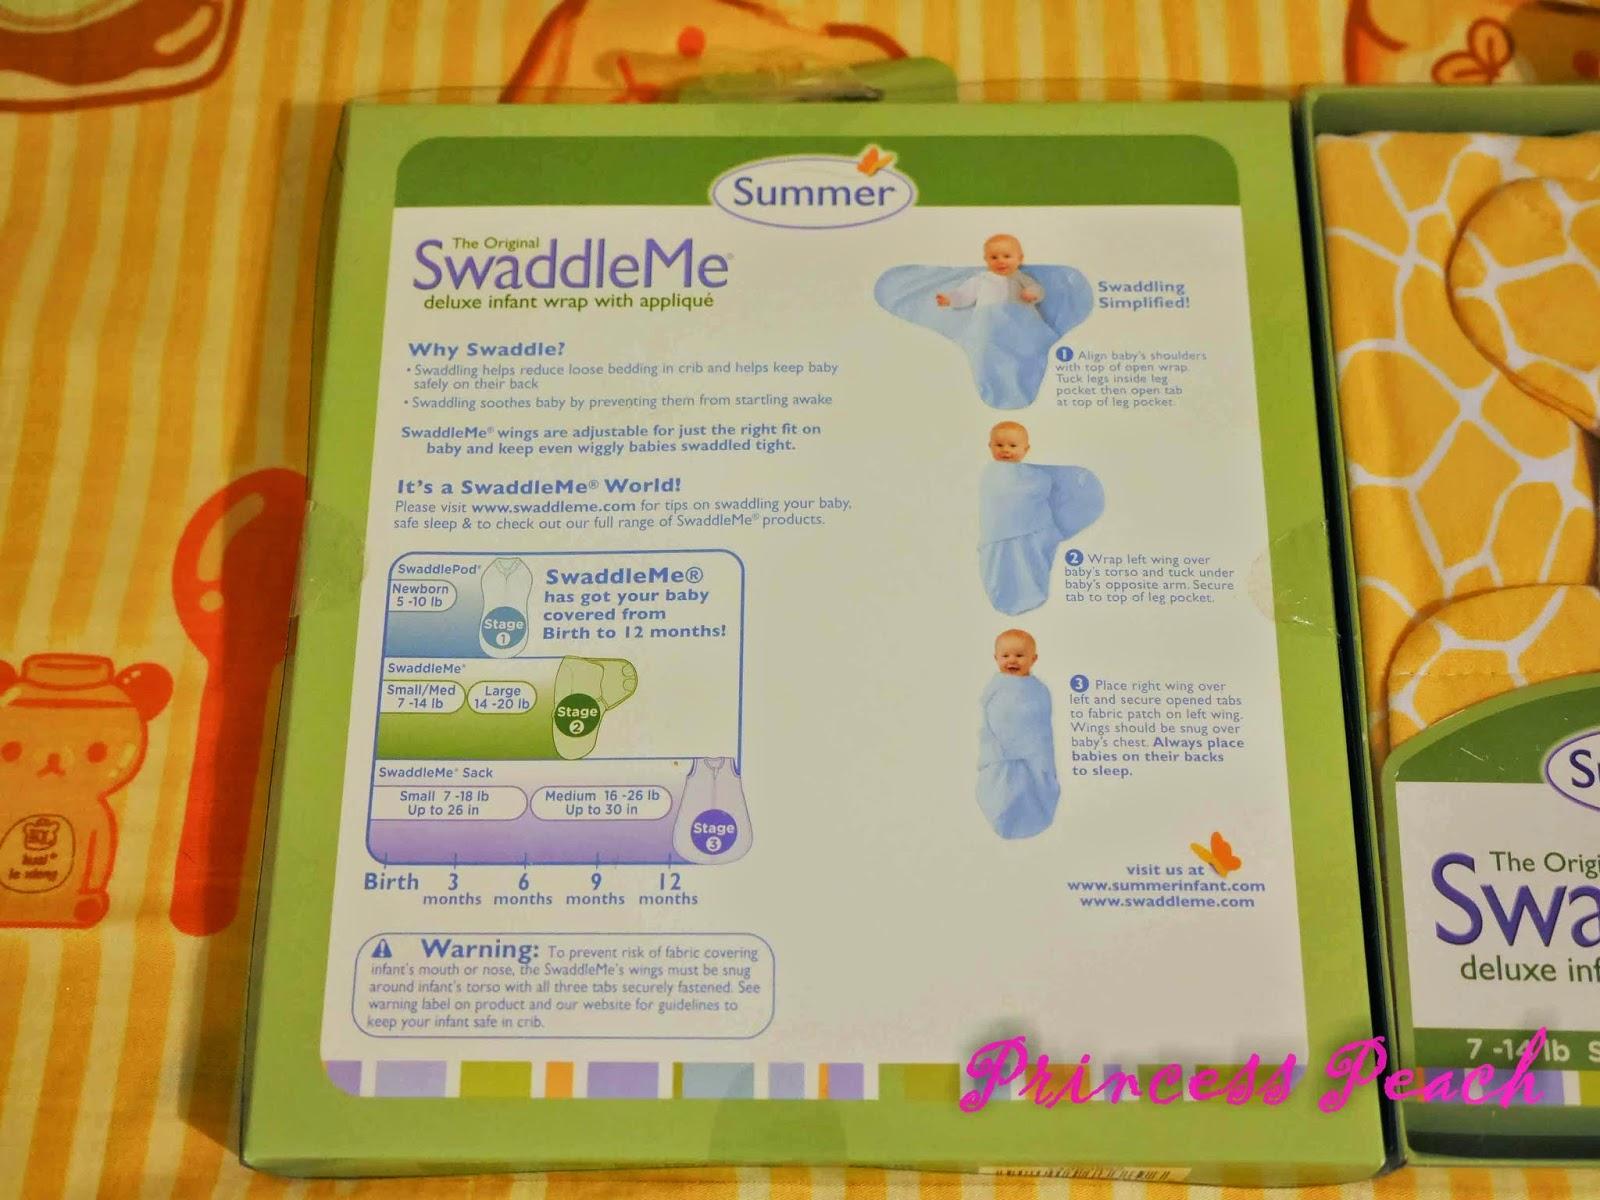 http://twpeach.blogspot.com/2015/03/swaddle-blanket.html